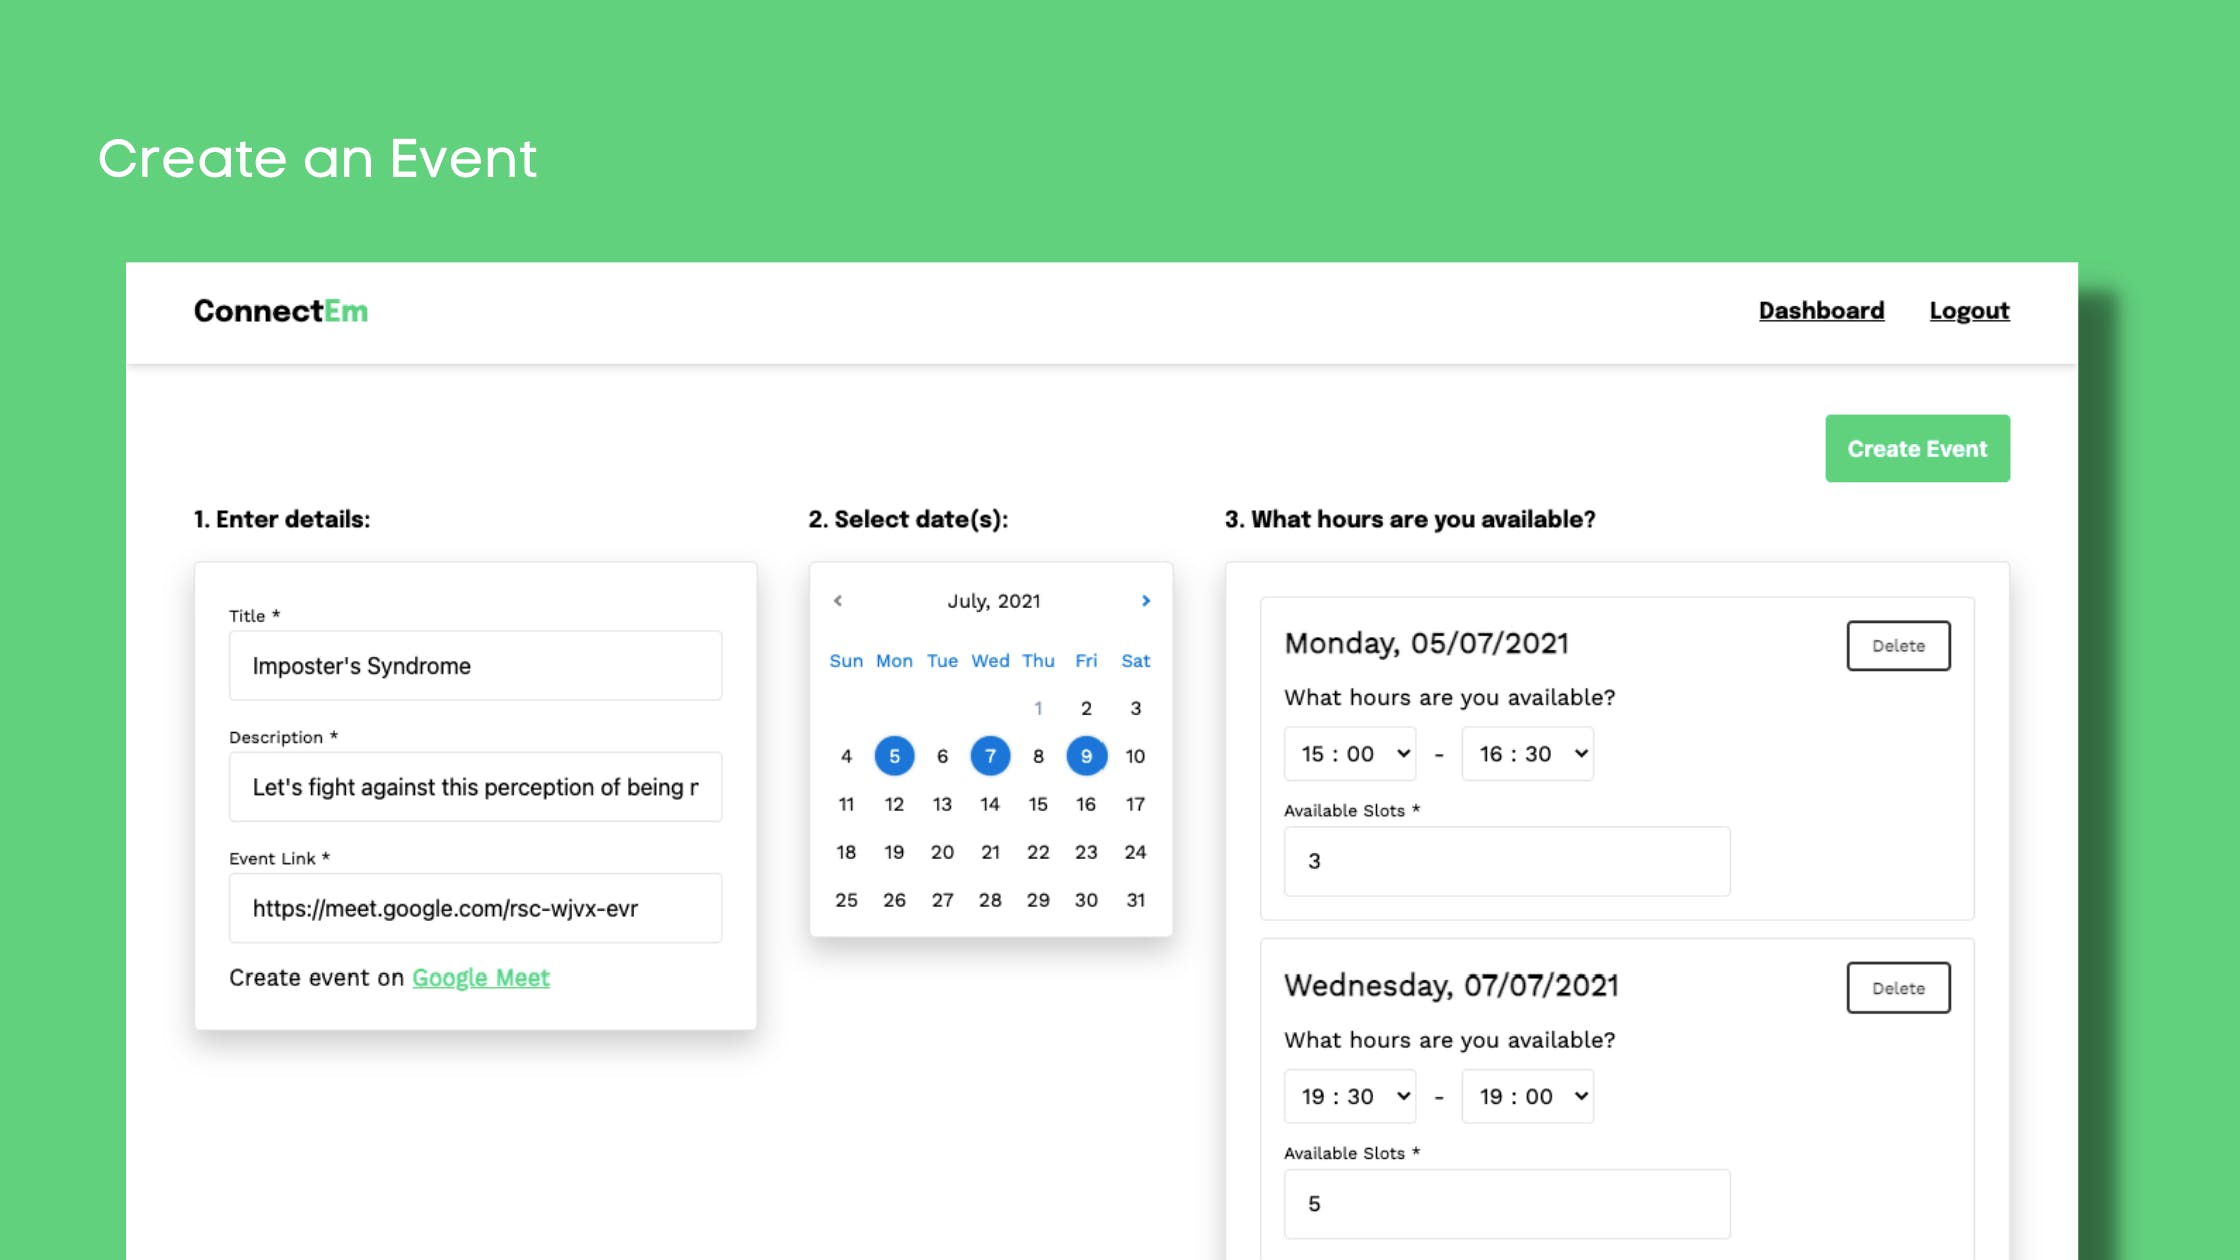 connectem-createEvent.png